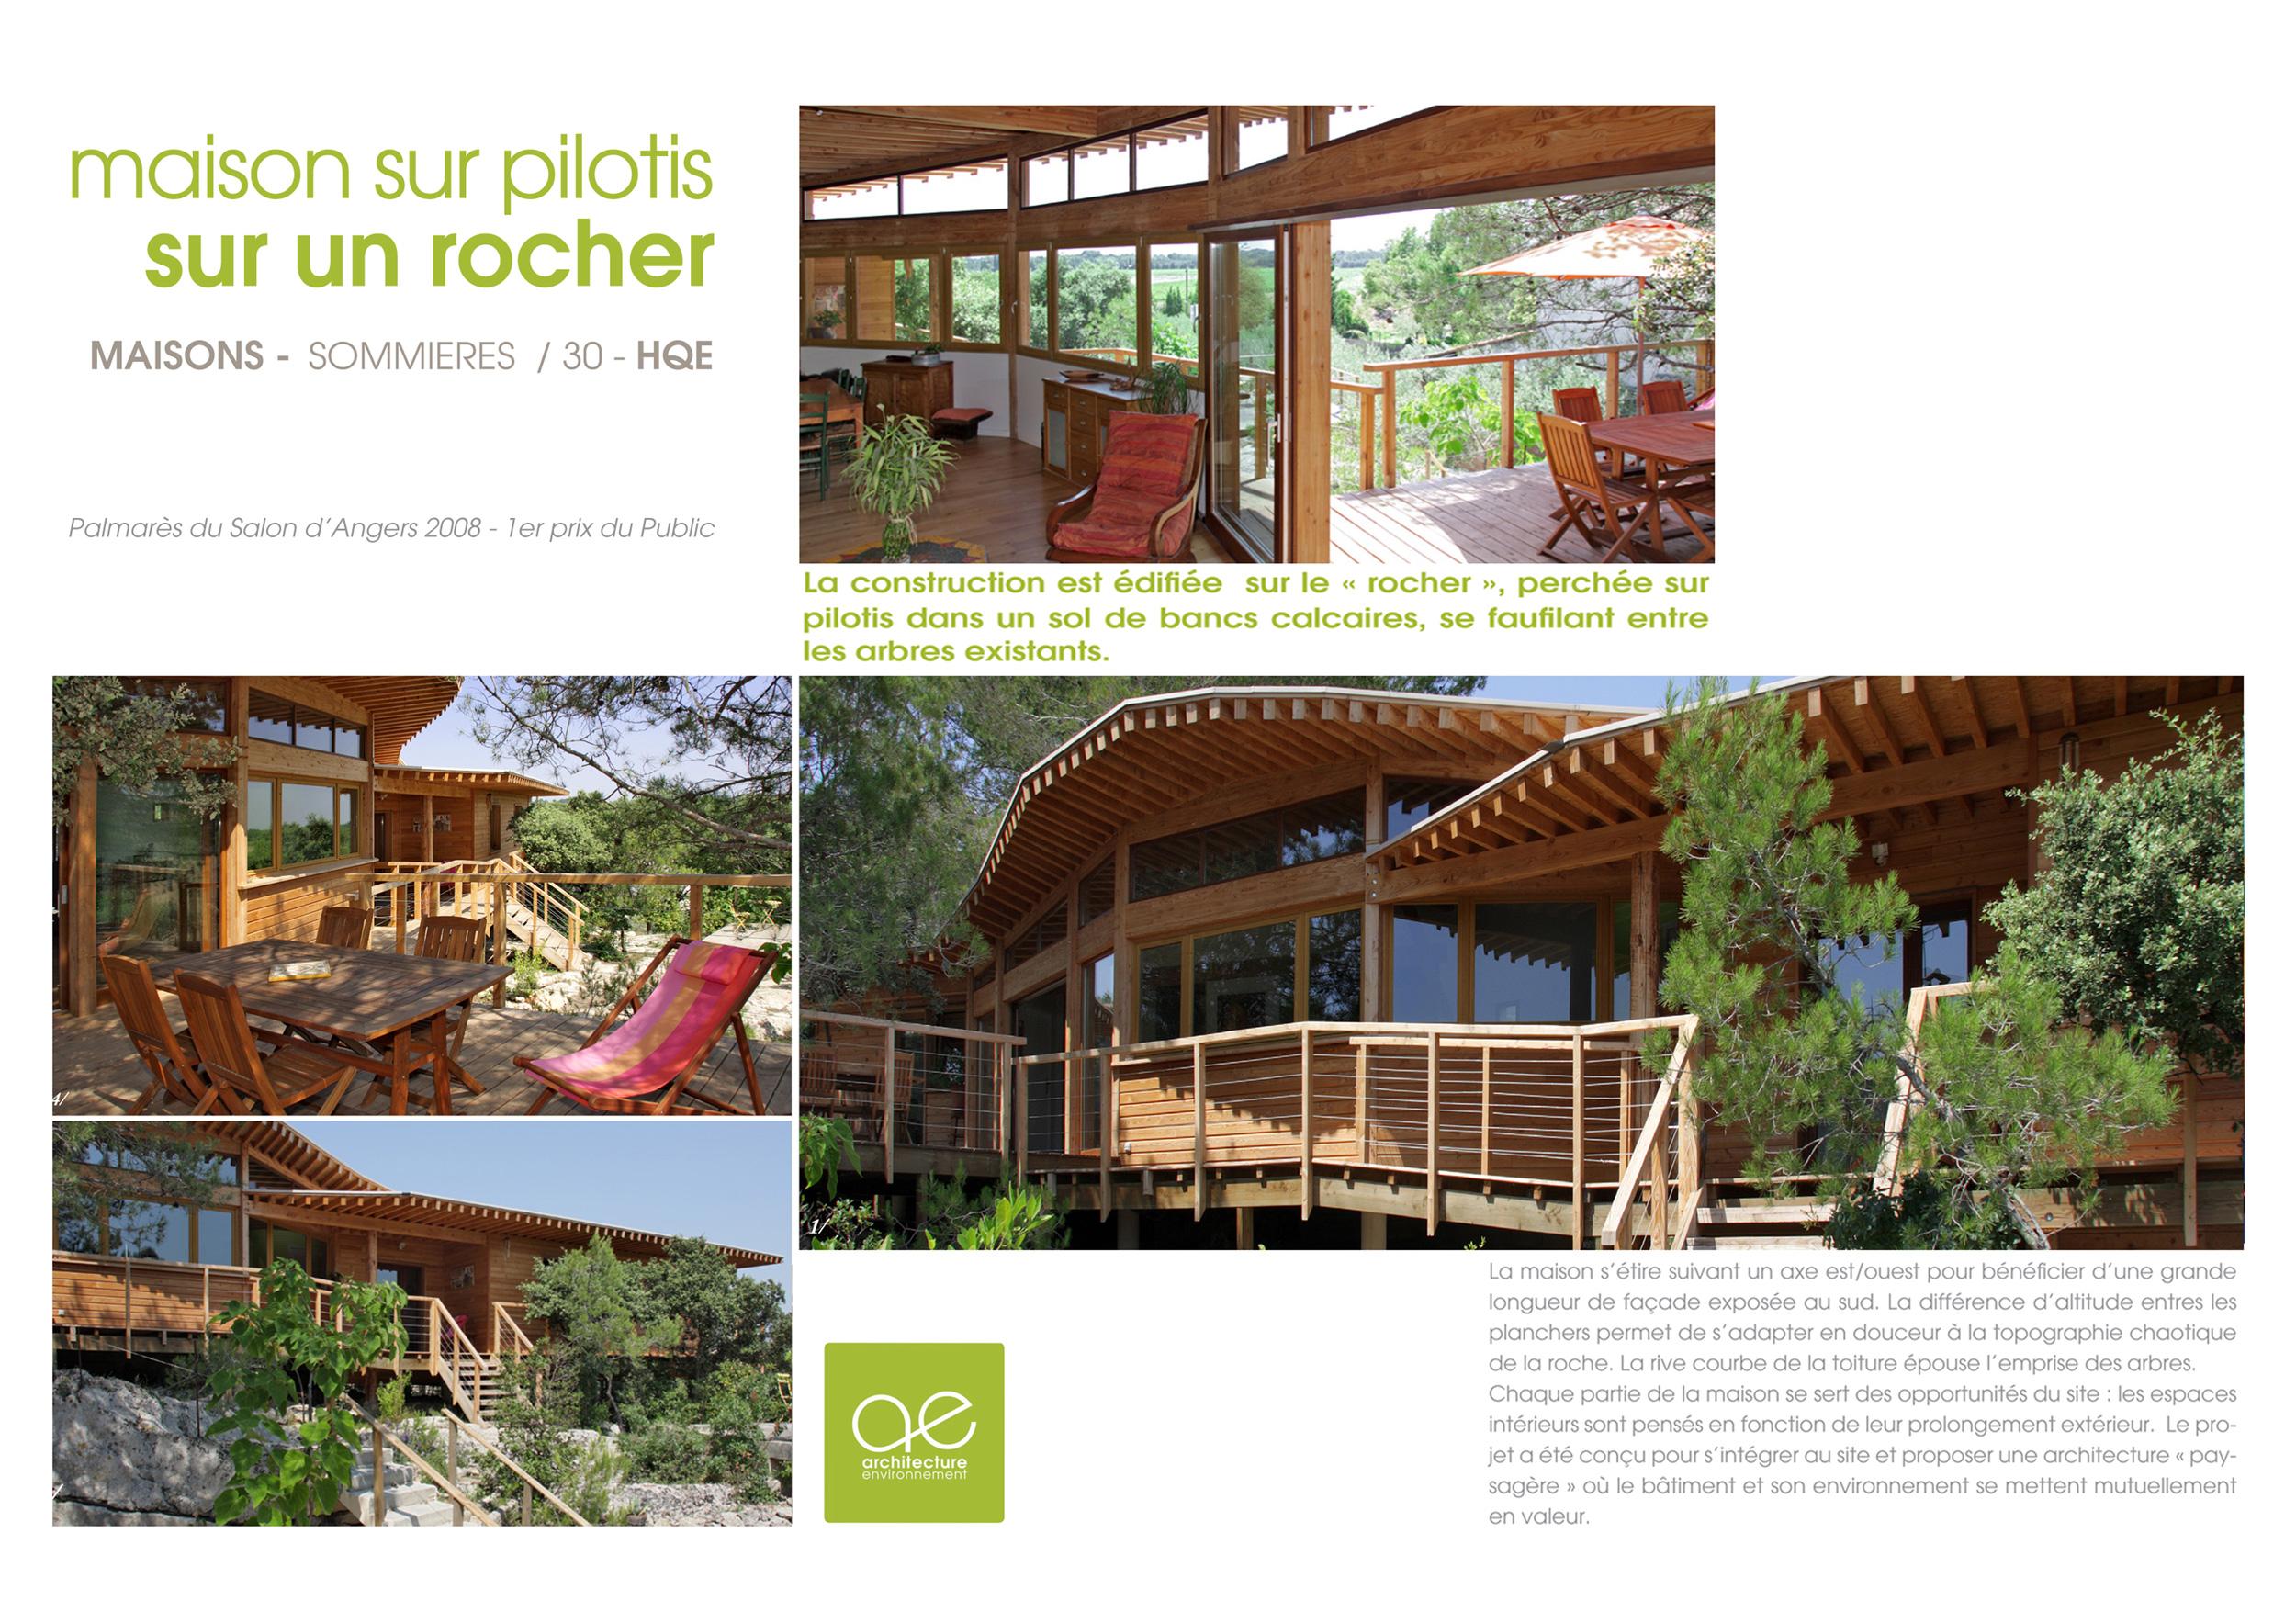 Maison sommi res architecture environnement pm for Maison sommieres